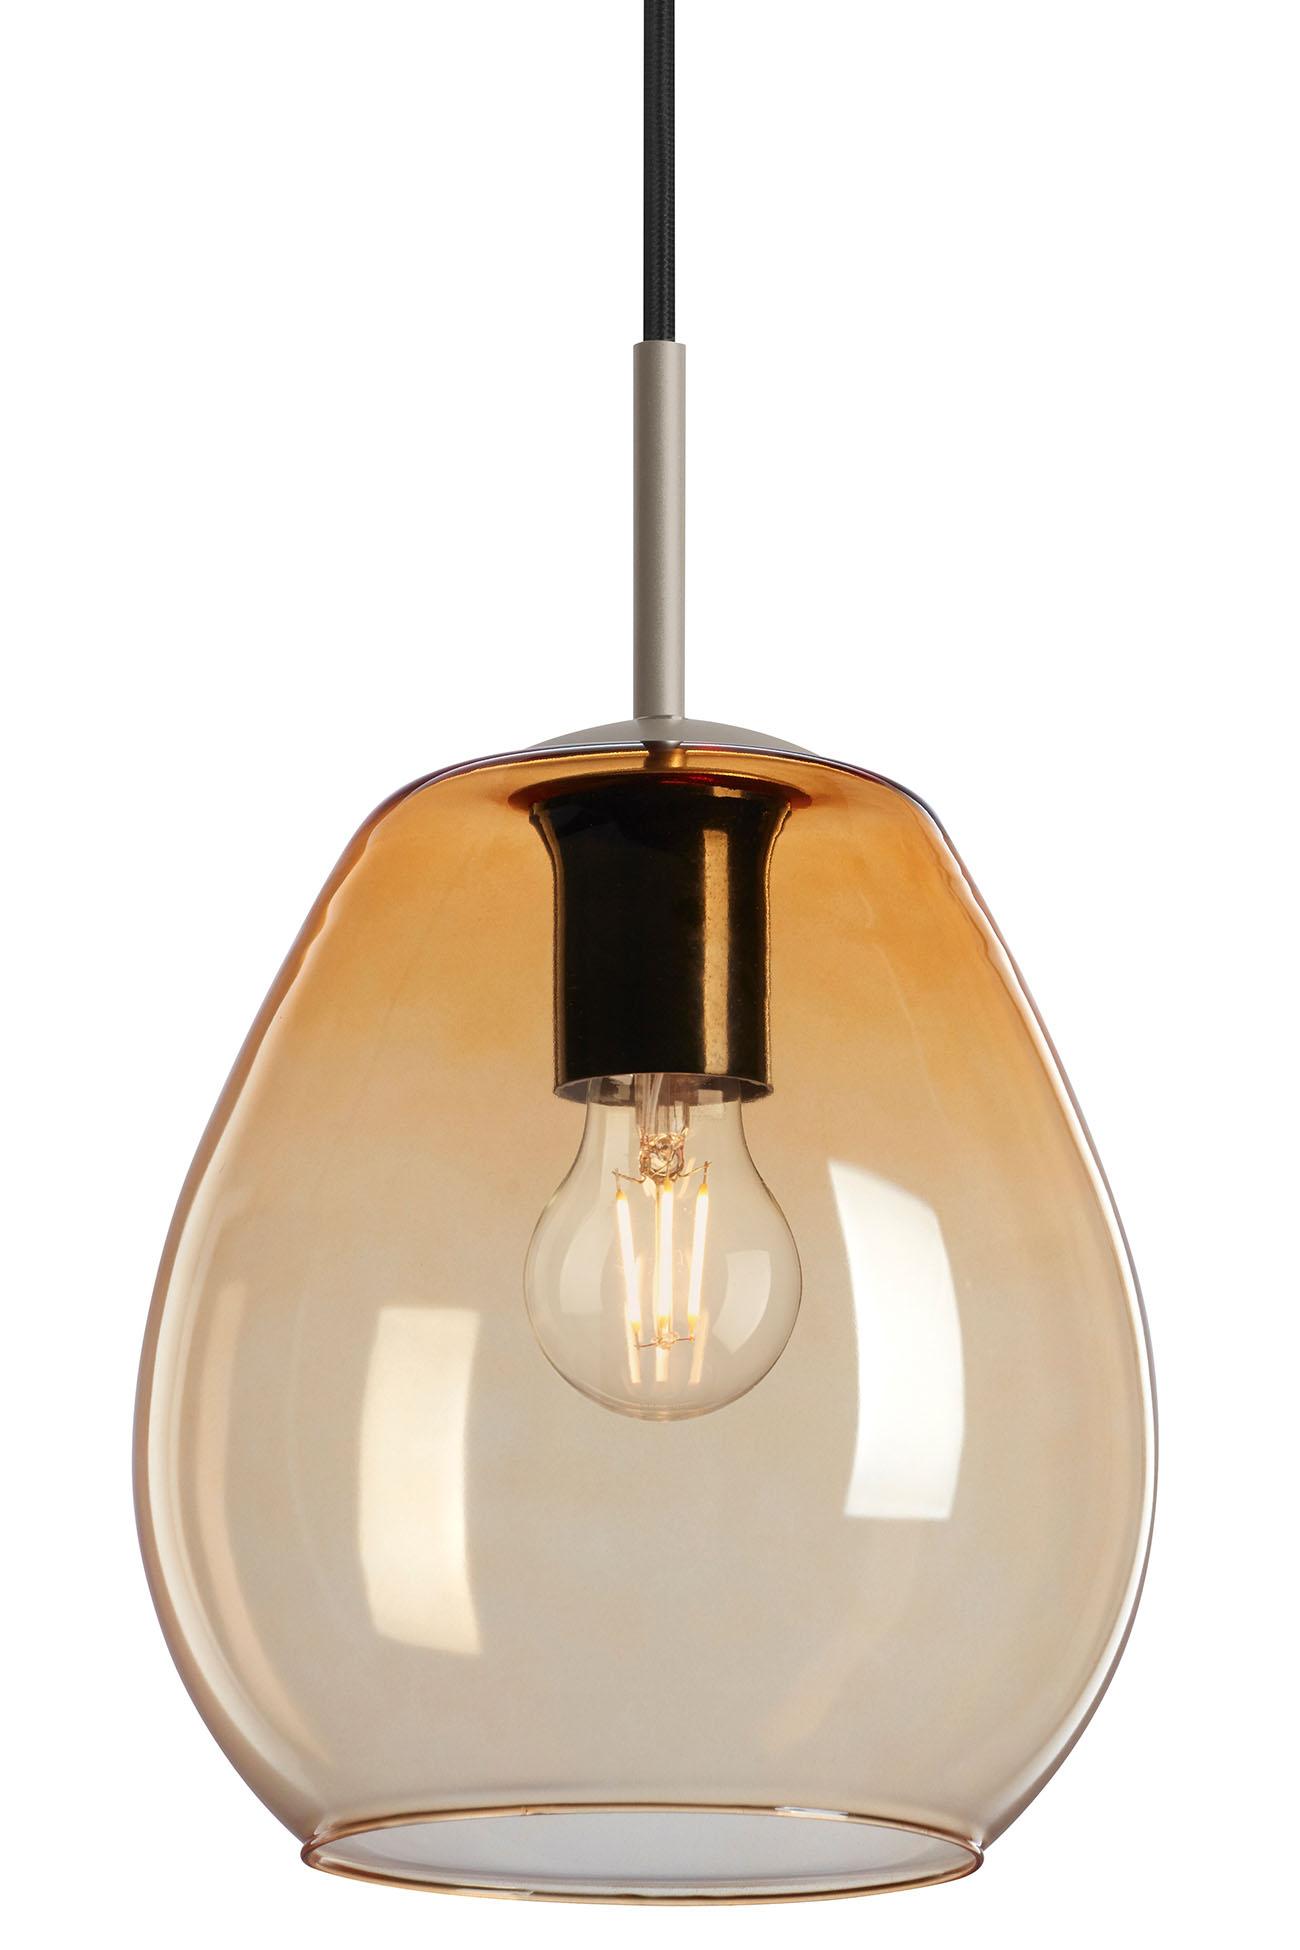 LED Pendelleuchte, Ø 22 cm, max. 40 W, Amber-Gold